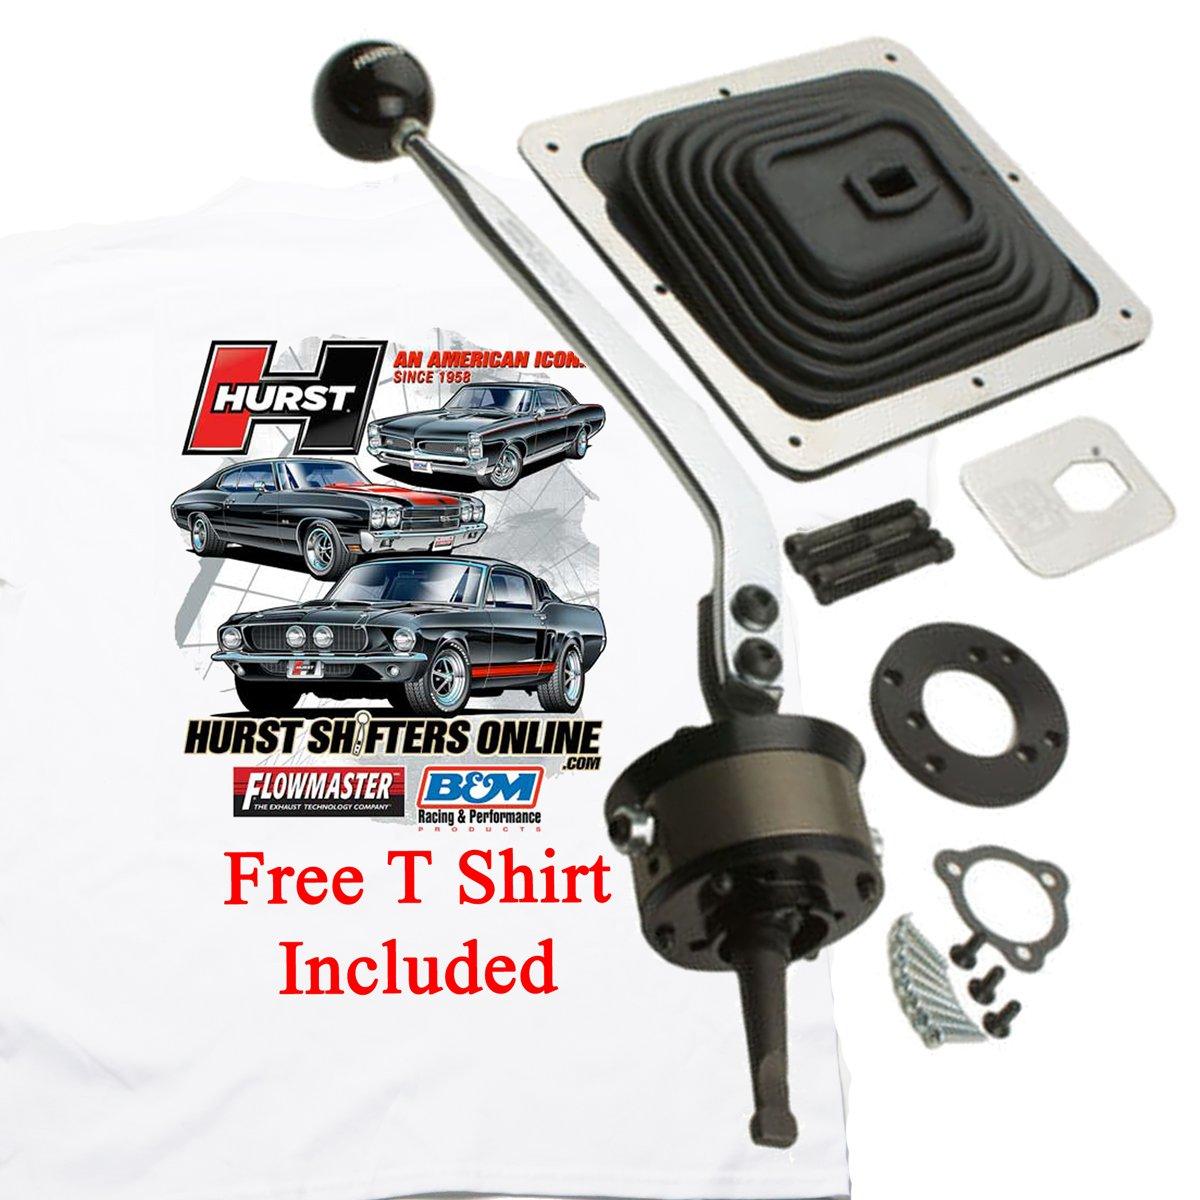 hight resolution of hurst 3915020 billet plus ford ranger manual shifter w free t shirt